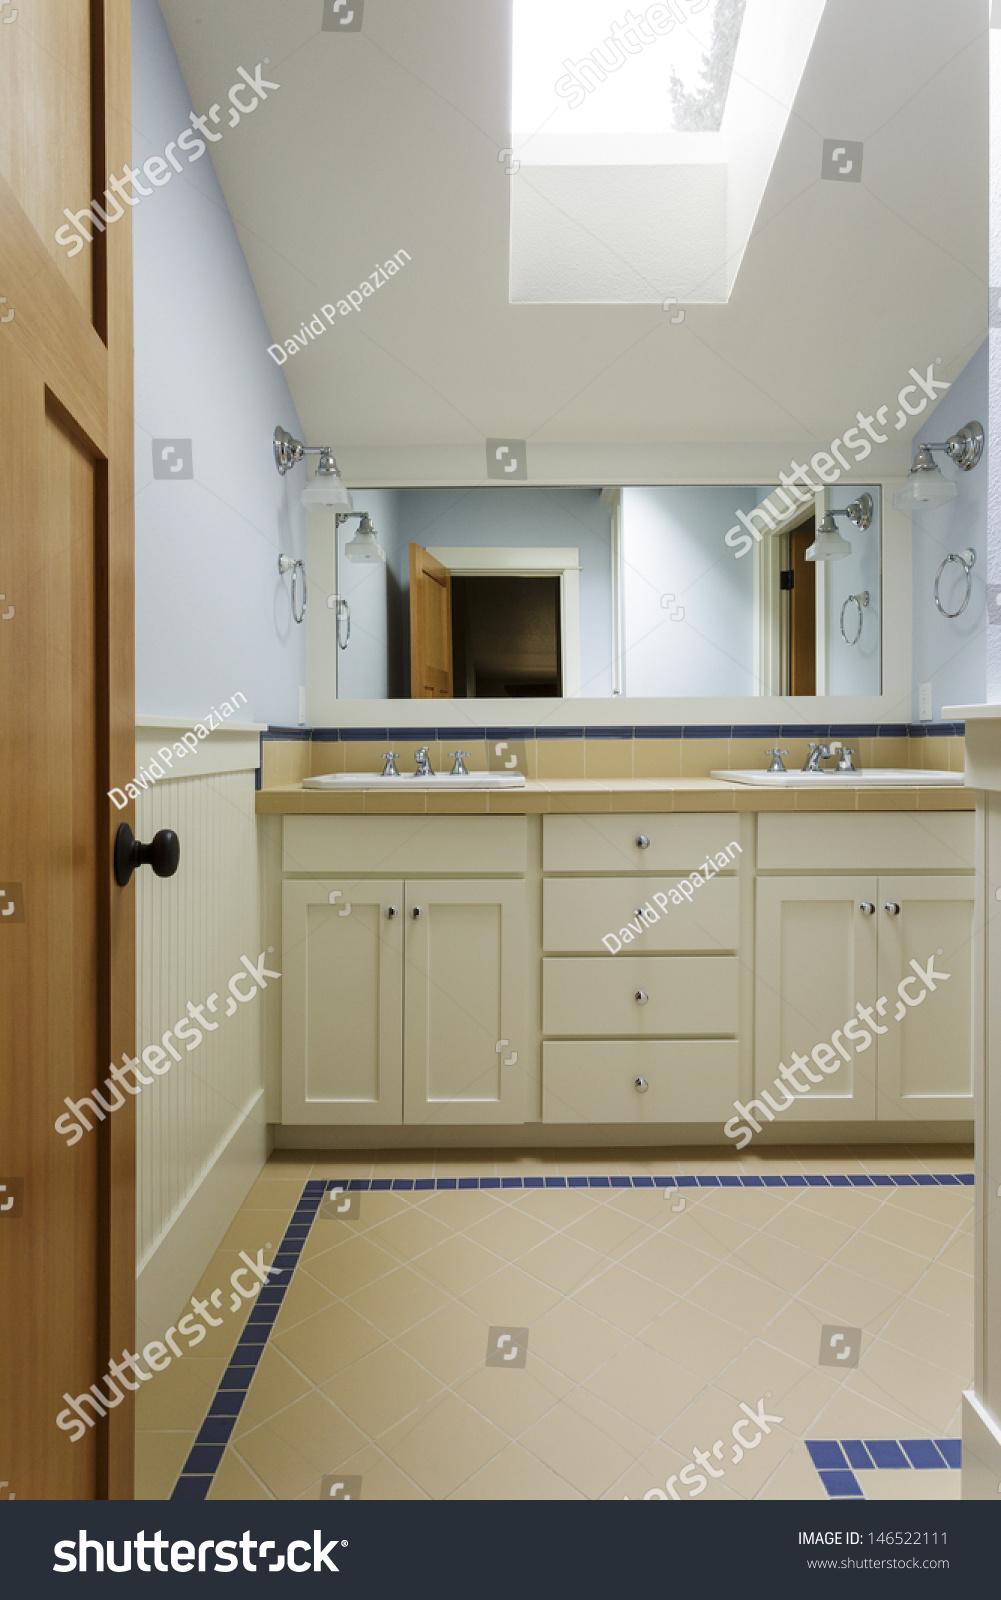 Image of: Bathroom Vanitycustom Master Bathroom Vanity Double Stock Photo Edit Now 146522111